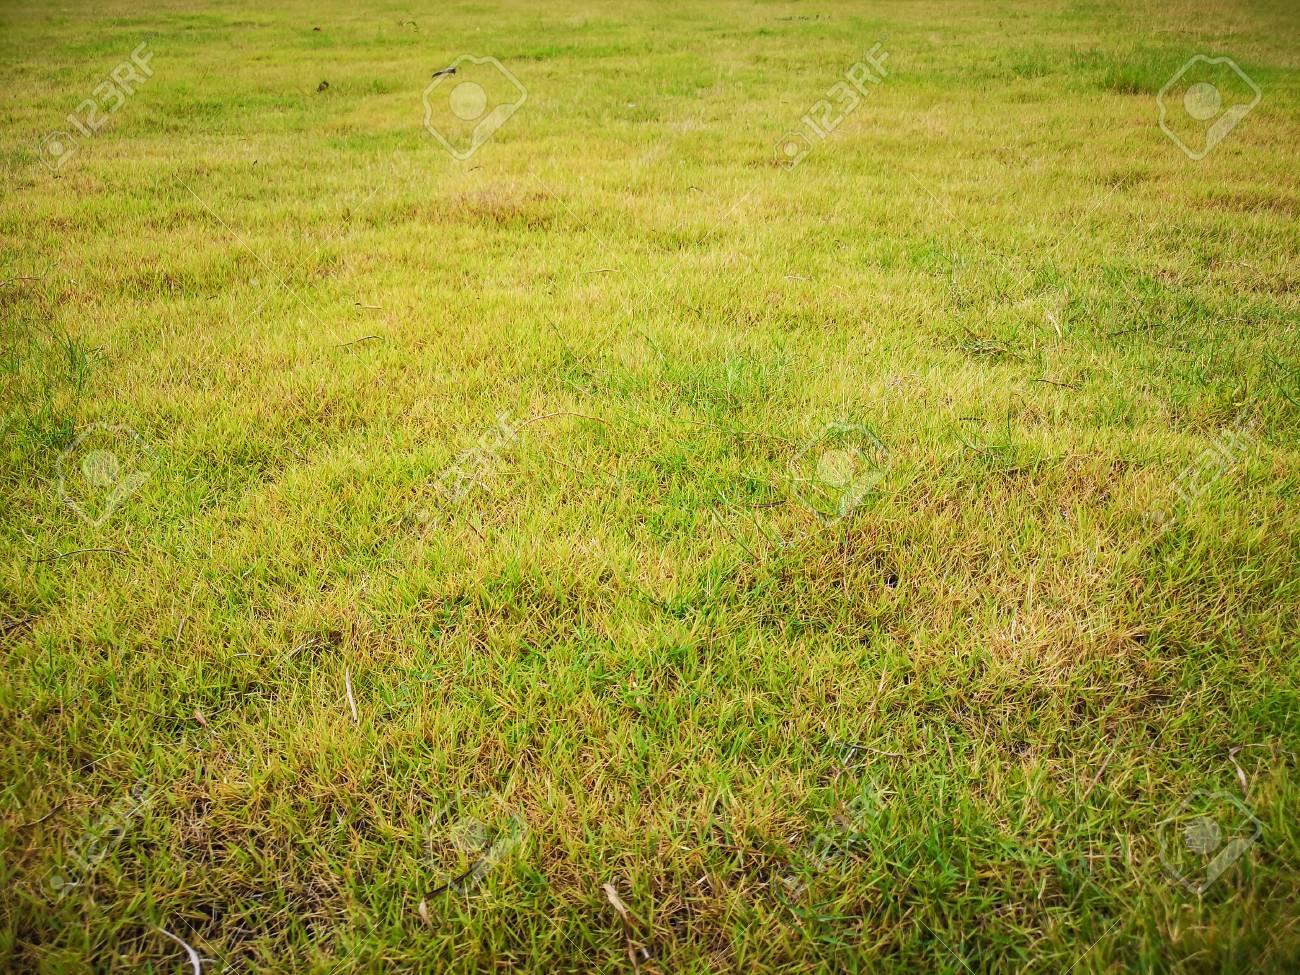 Empty fresh green grass field bakground - 105930563